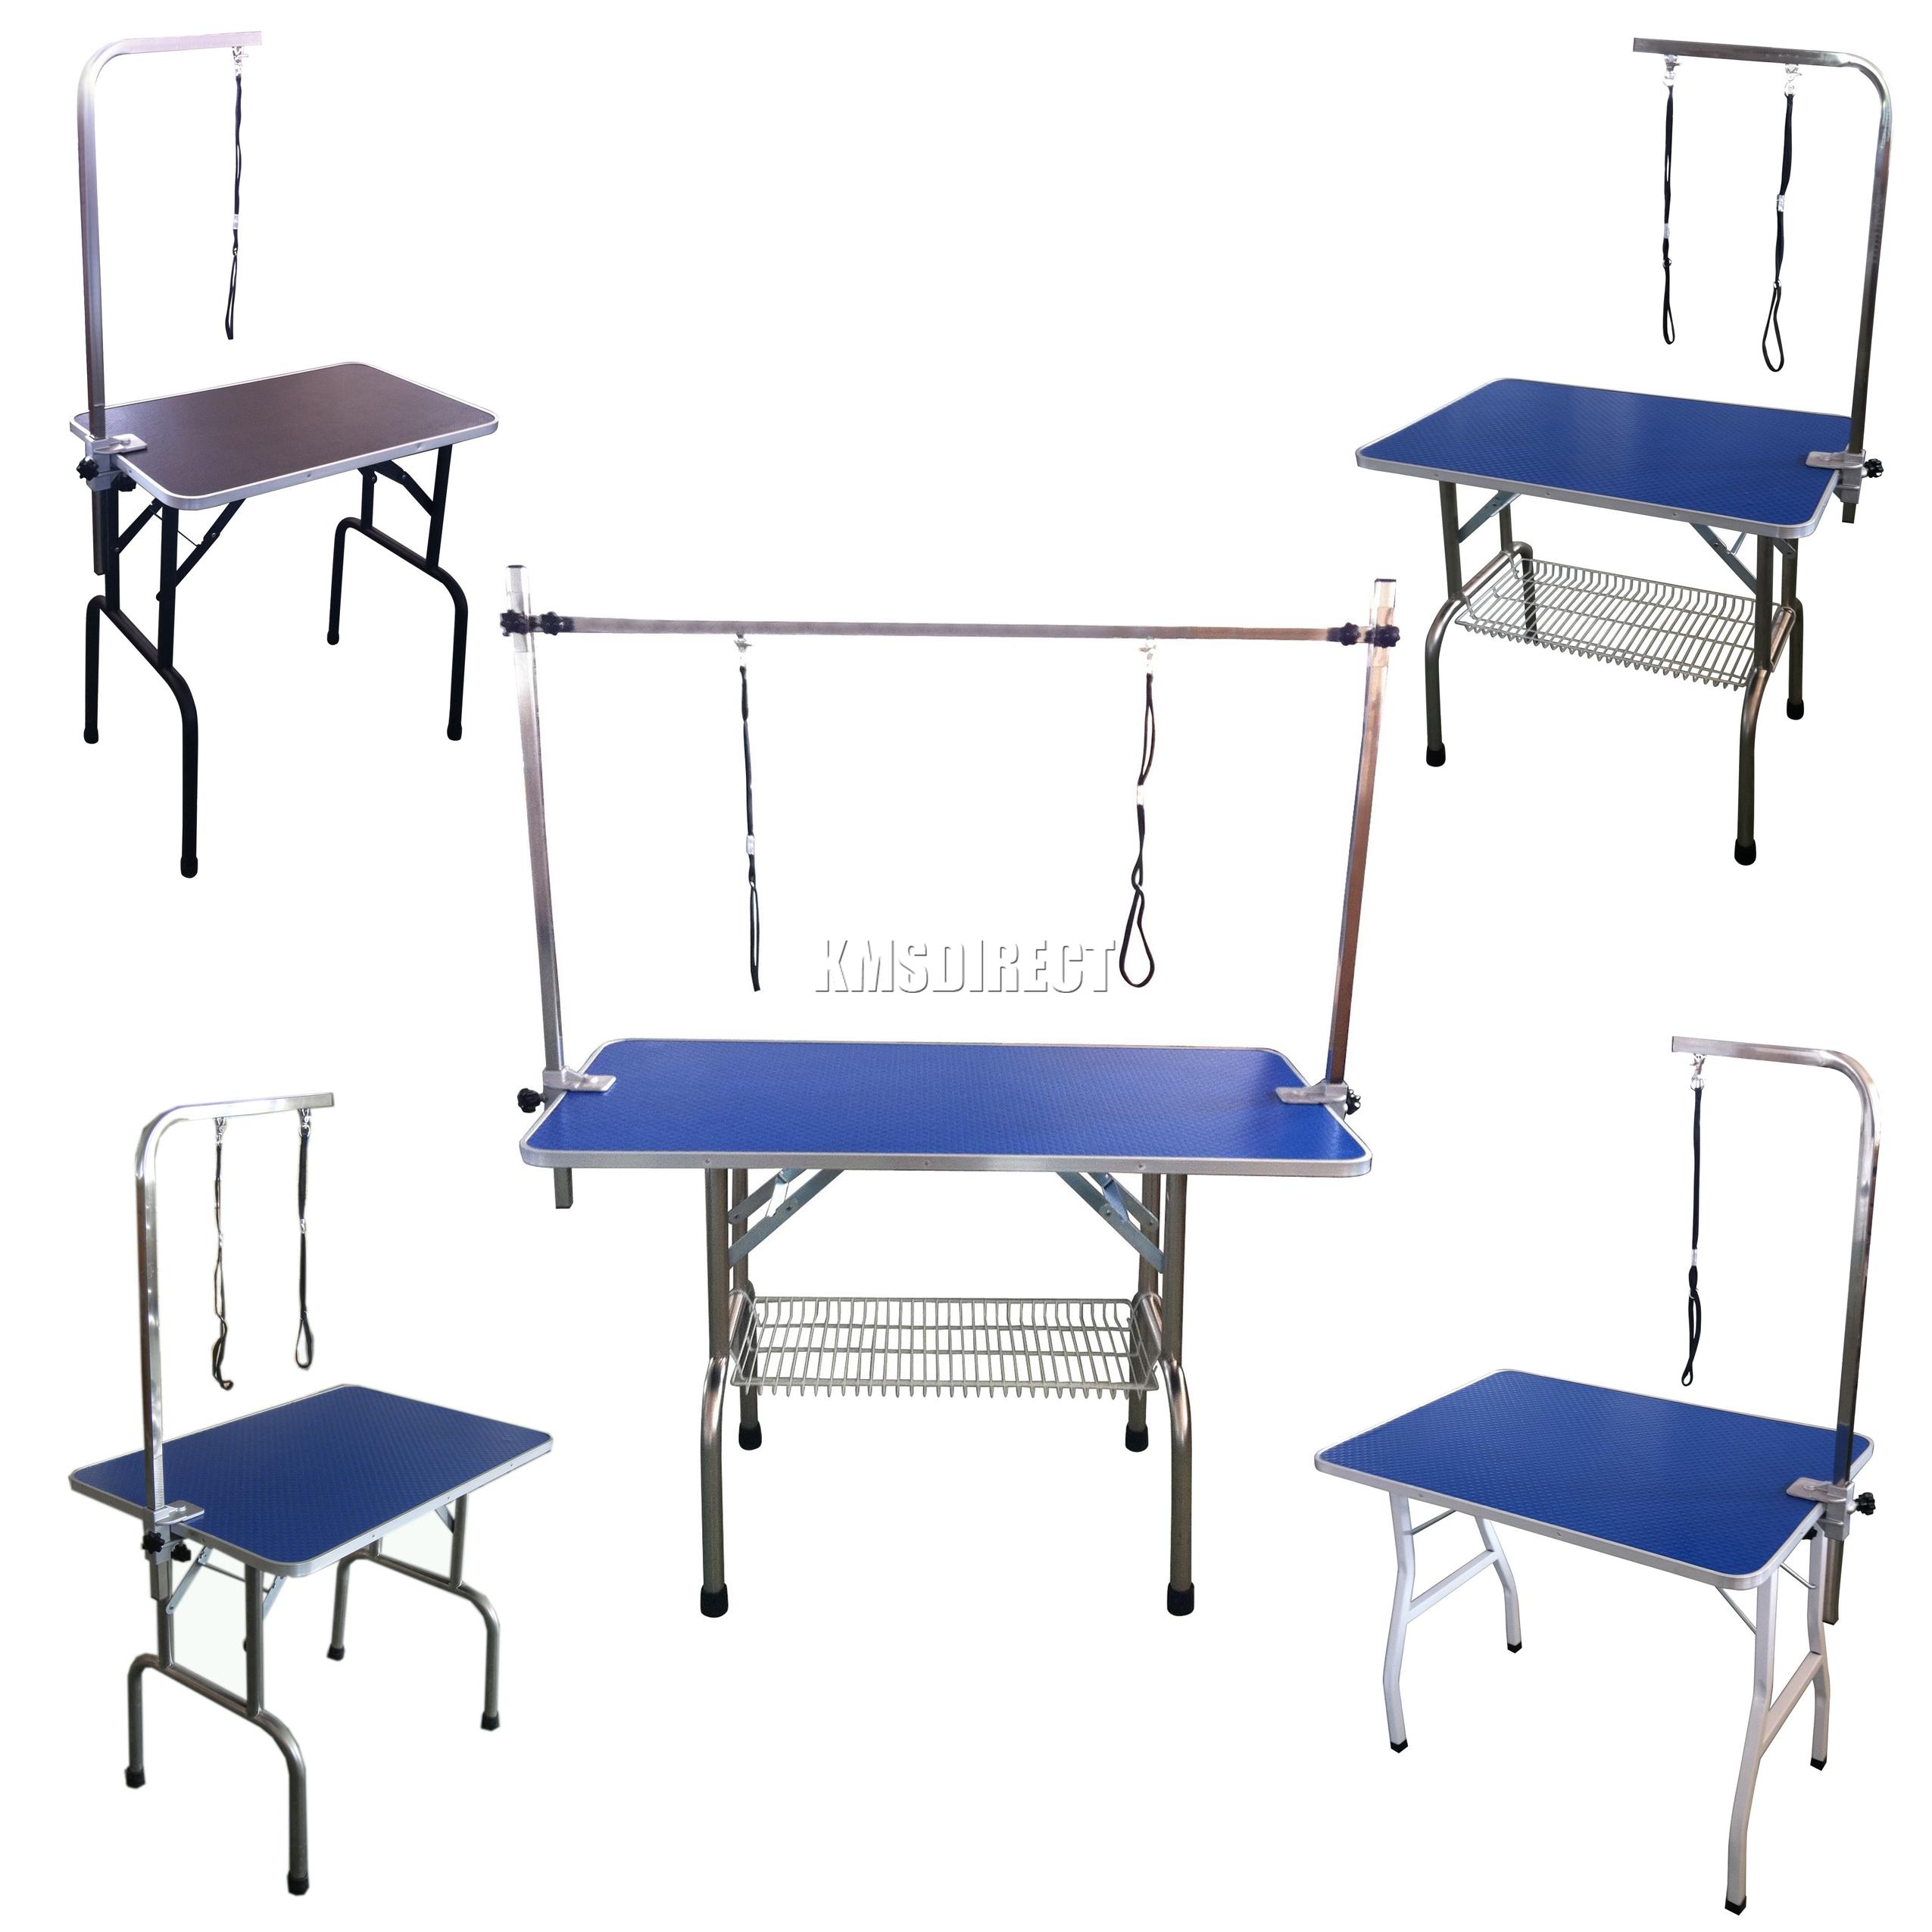 Foxhunter Folding Dog Pet Grooming Table